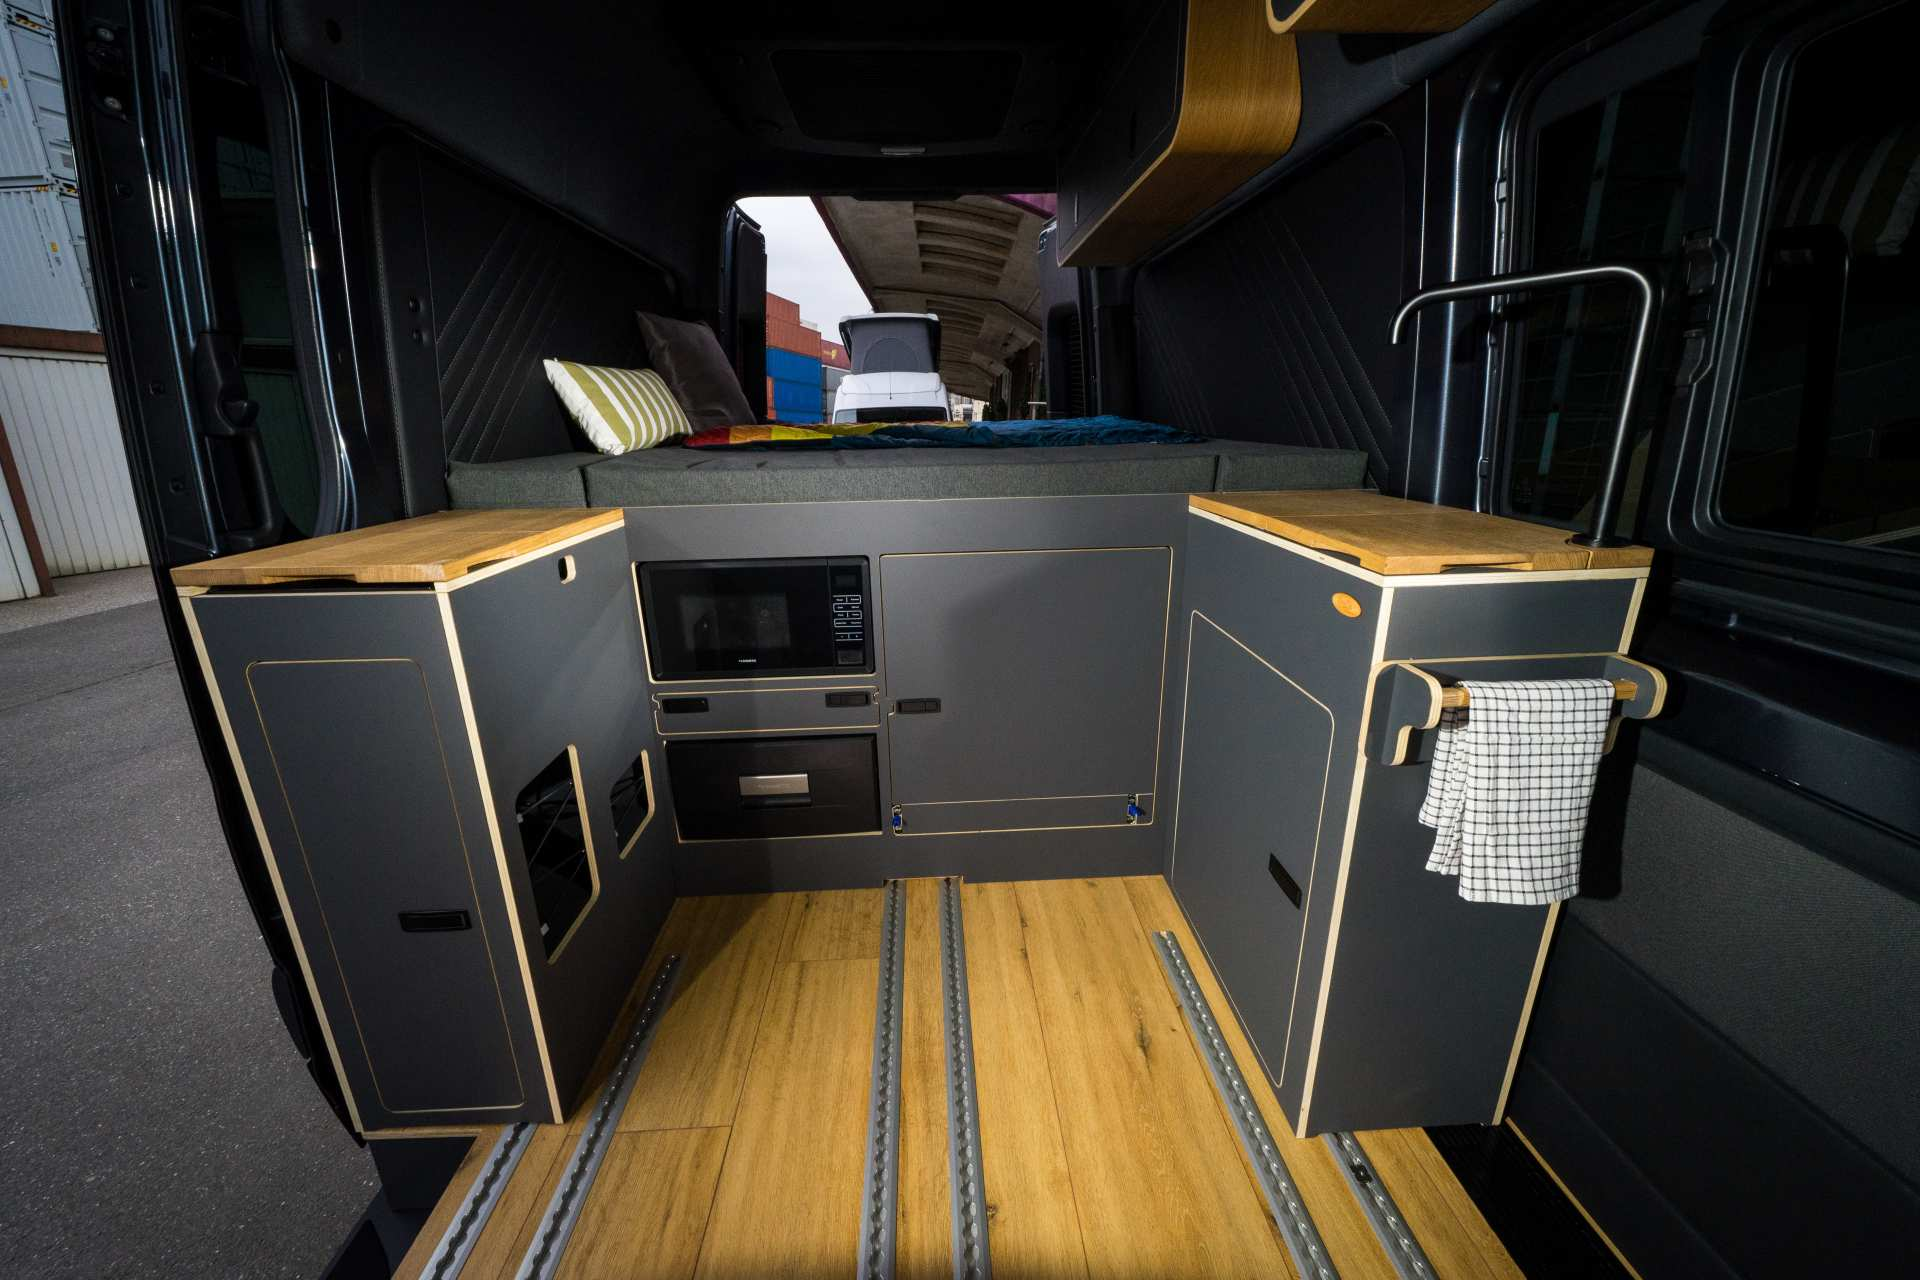 Individualausbau: Mercedes L2 H2 Mixto - 10